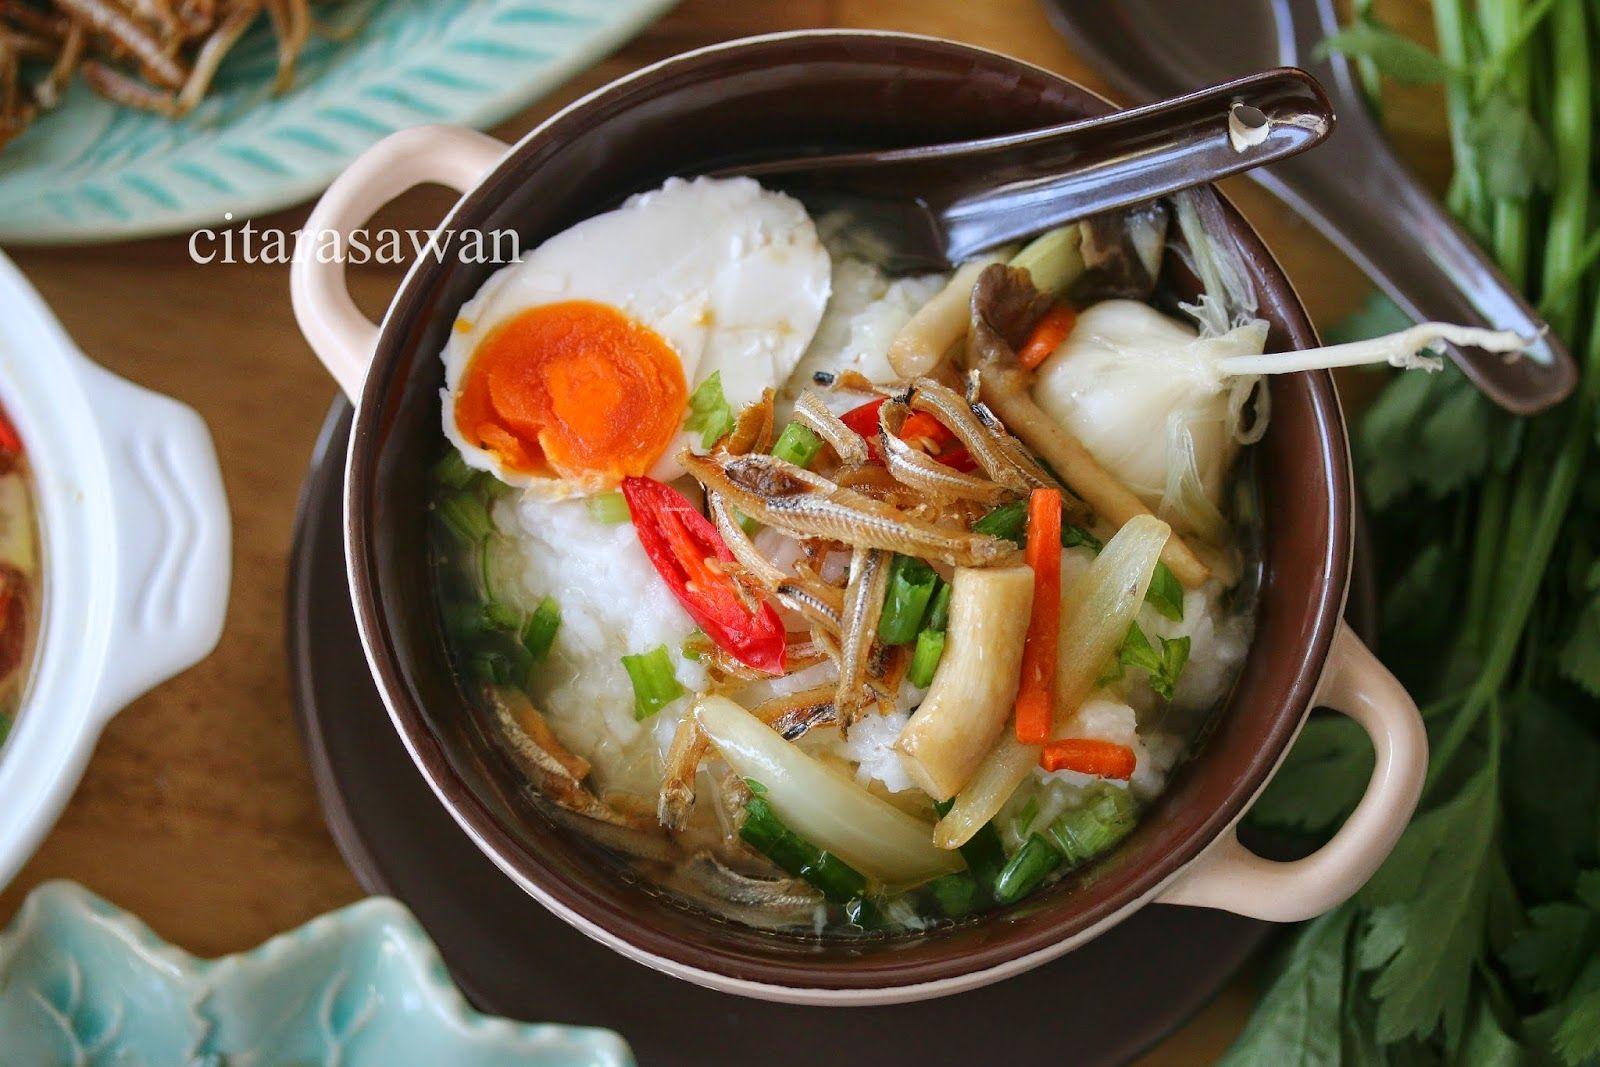 Bubur Nasi Berlauk Kelantan Resipi Citarasawan Resep Makanan Resep Sederhana Makanan